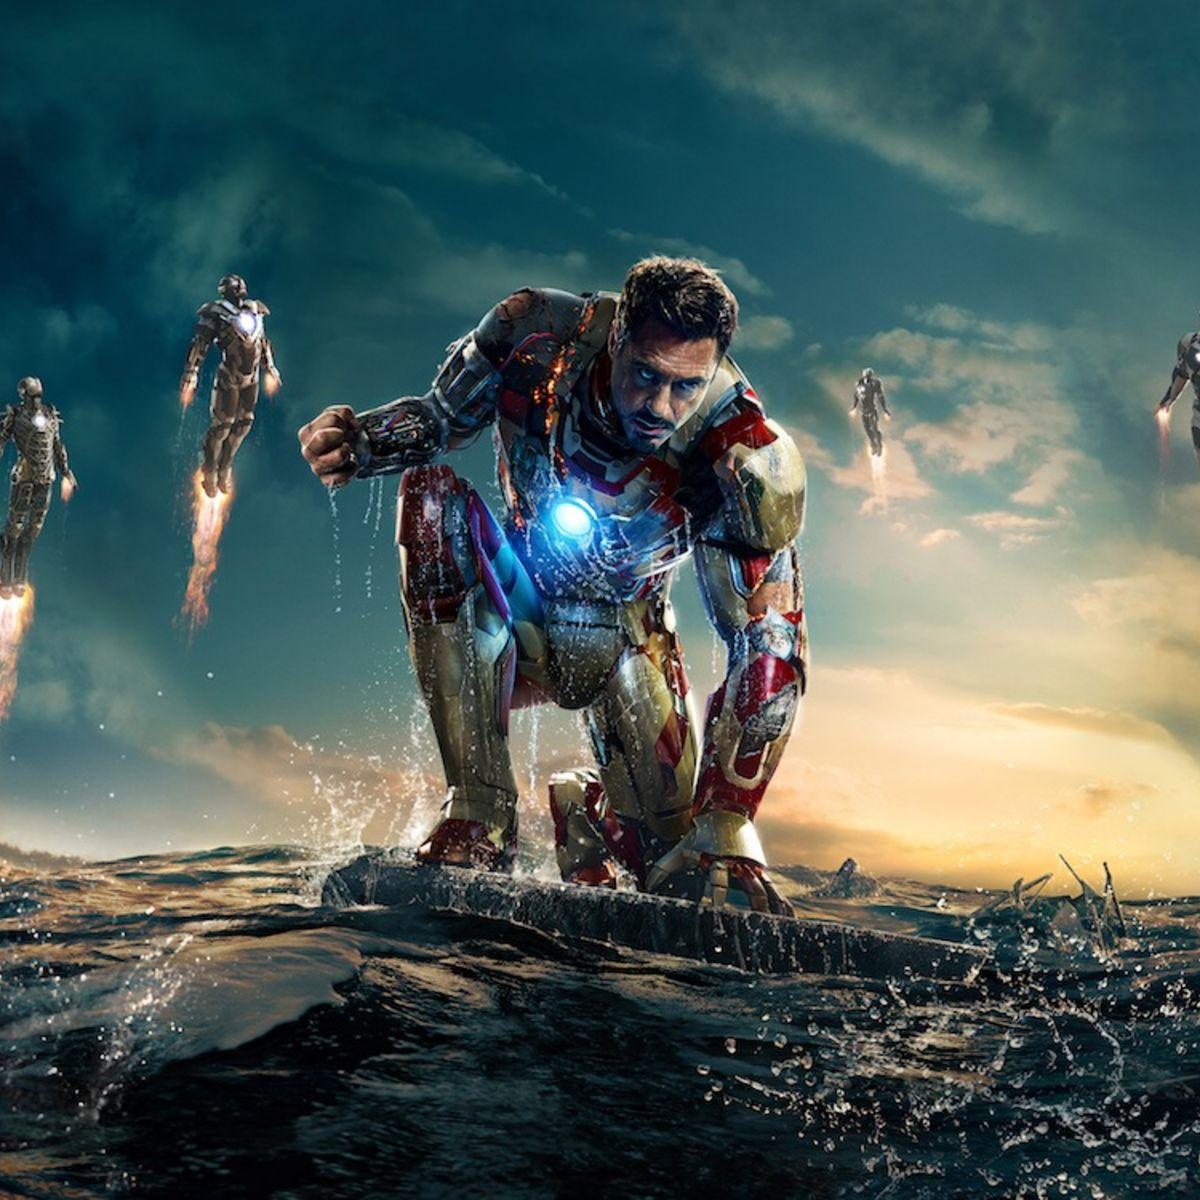 iron_man_3_new-wide.jpg